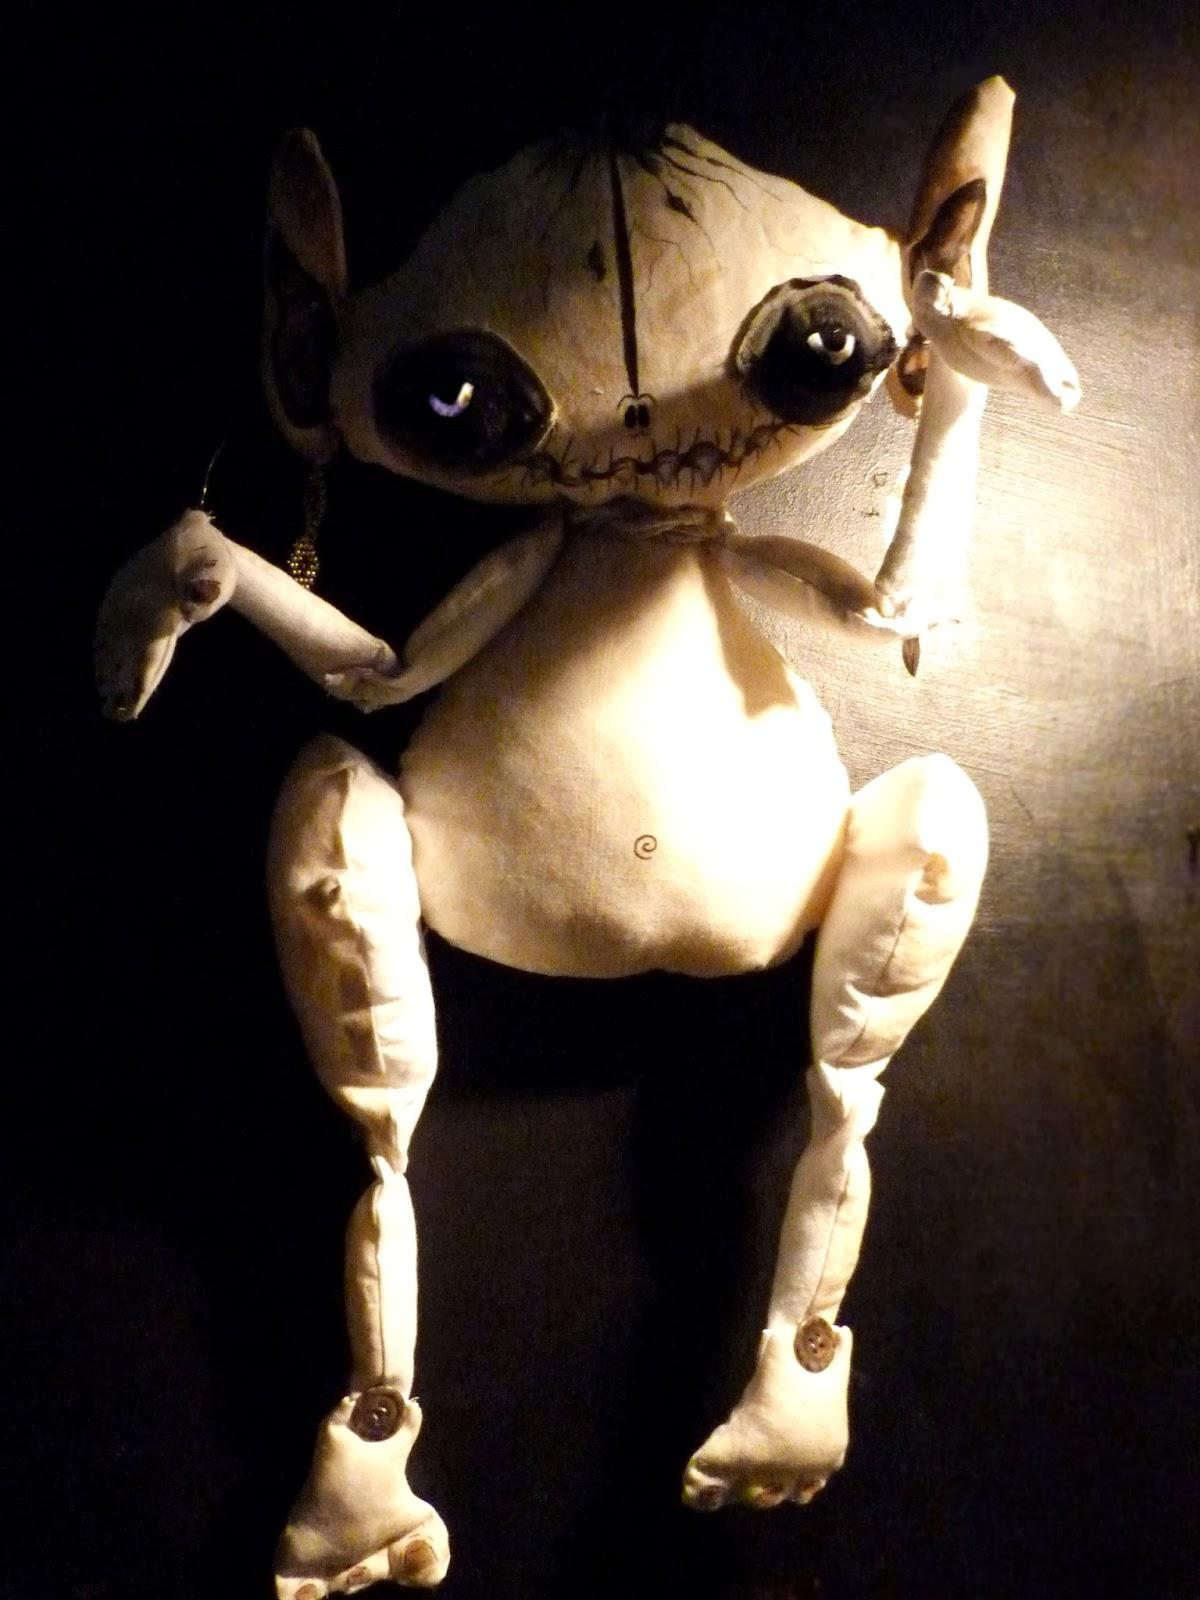 Digital Portfolio: Puppet Project 'Mythical Creatures'